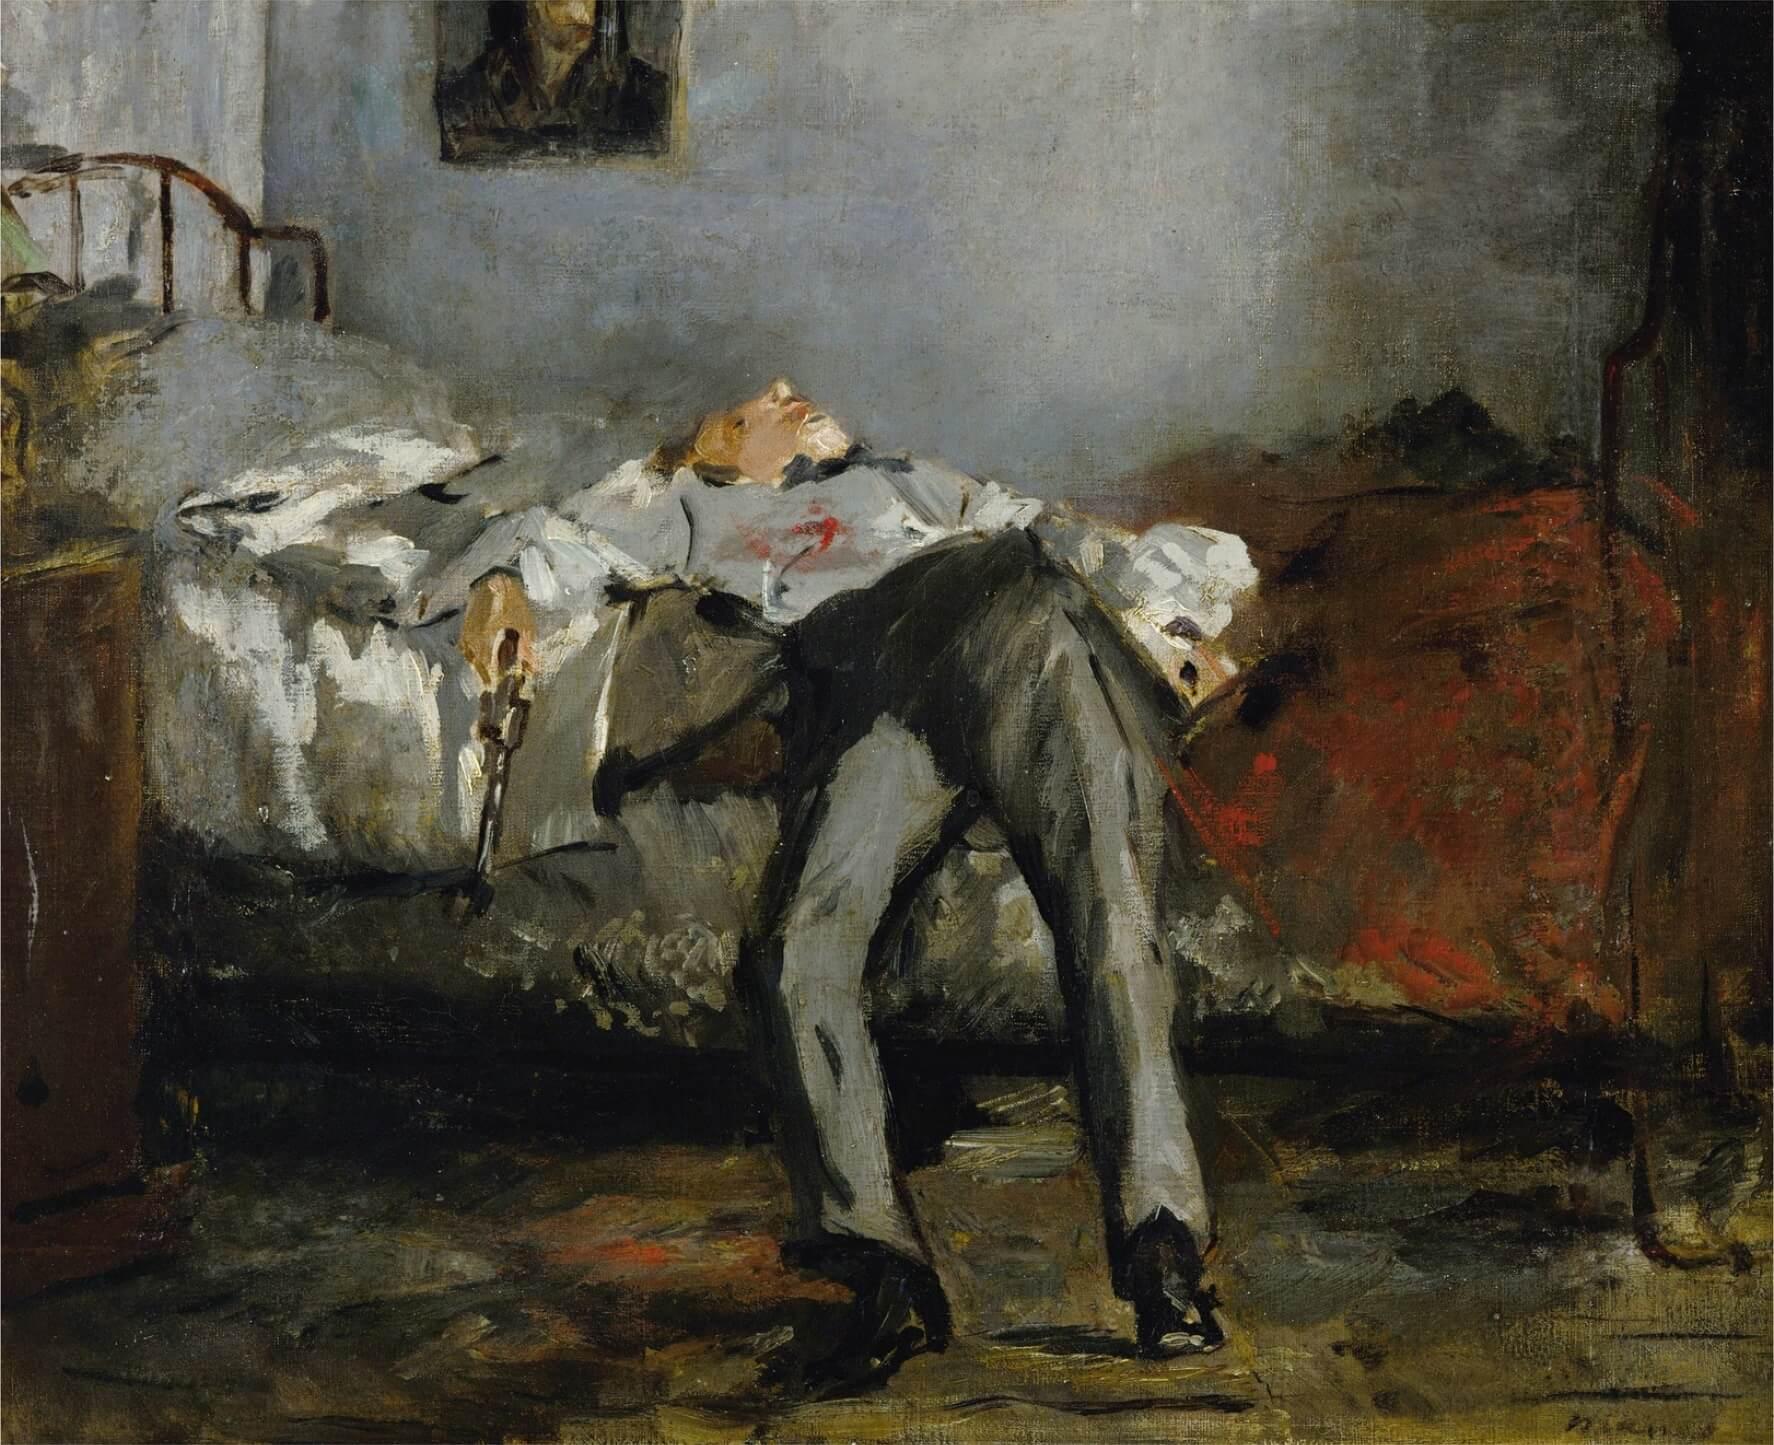 intihar Édouard Manet